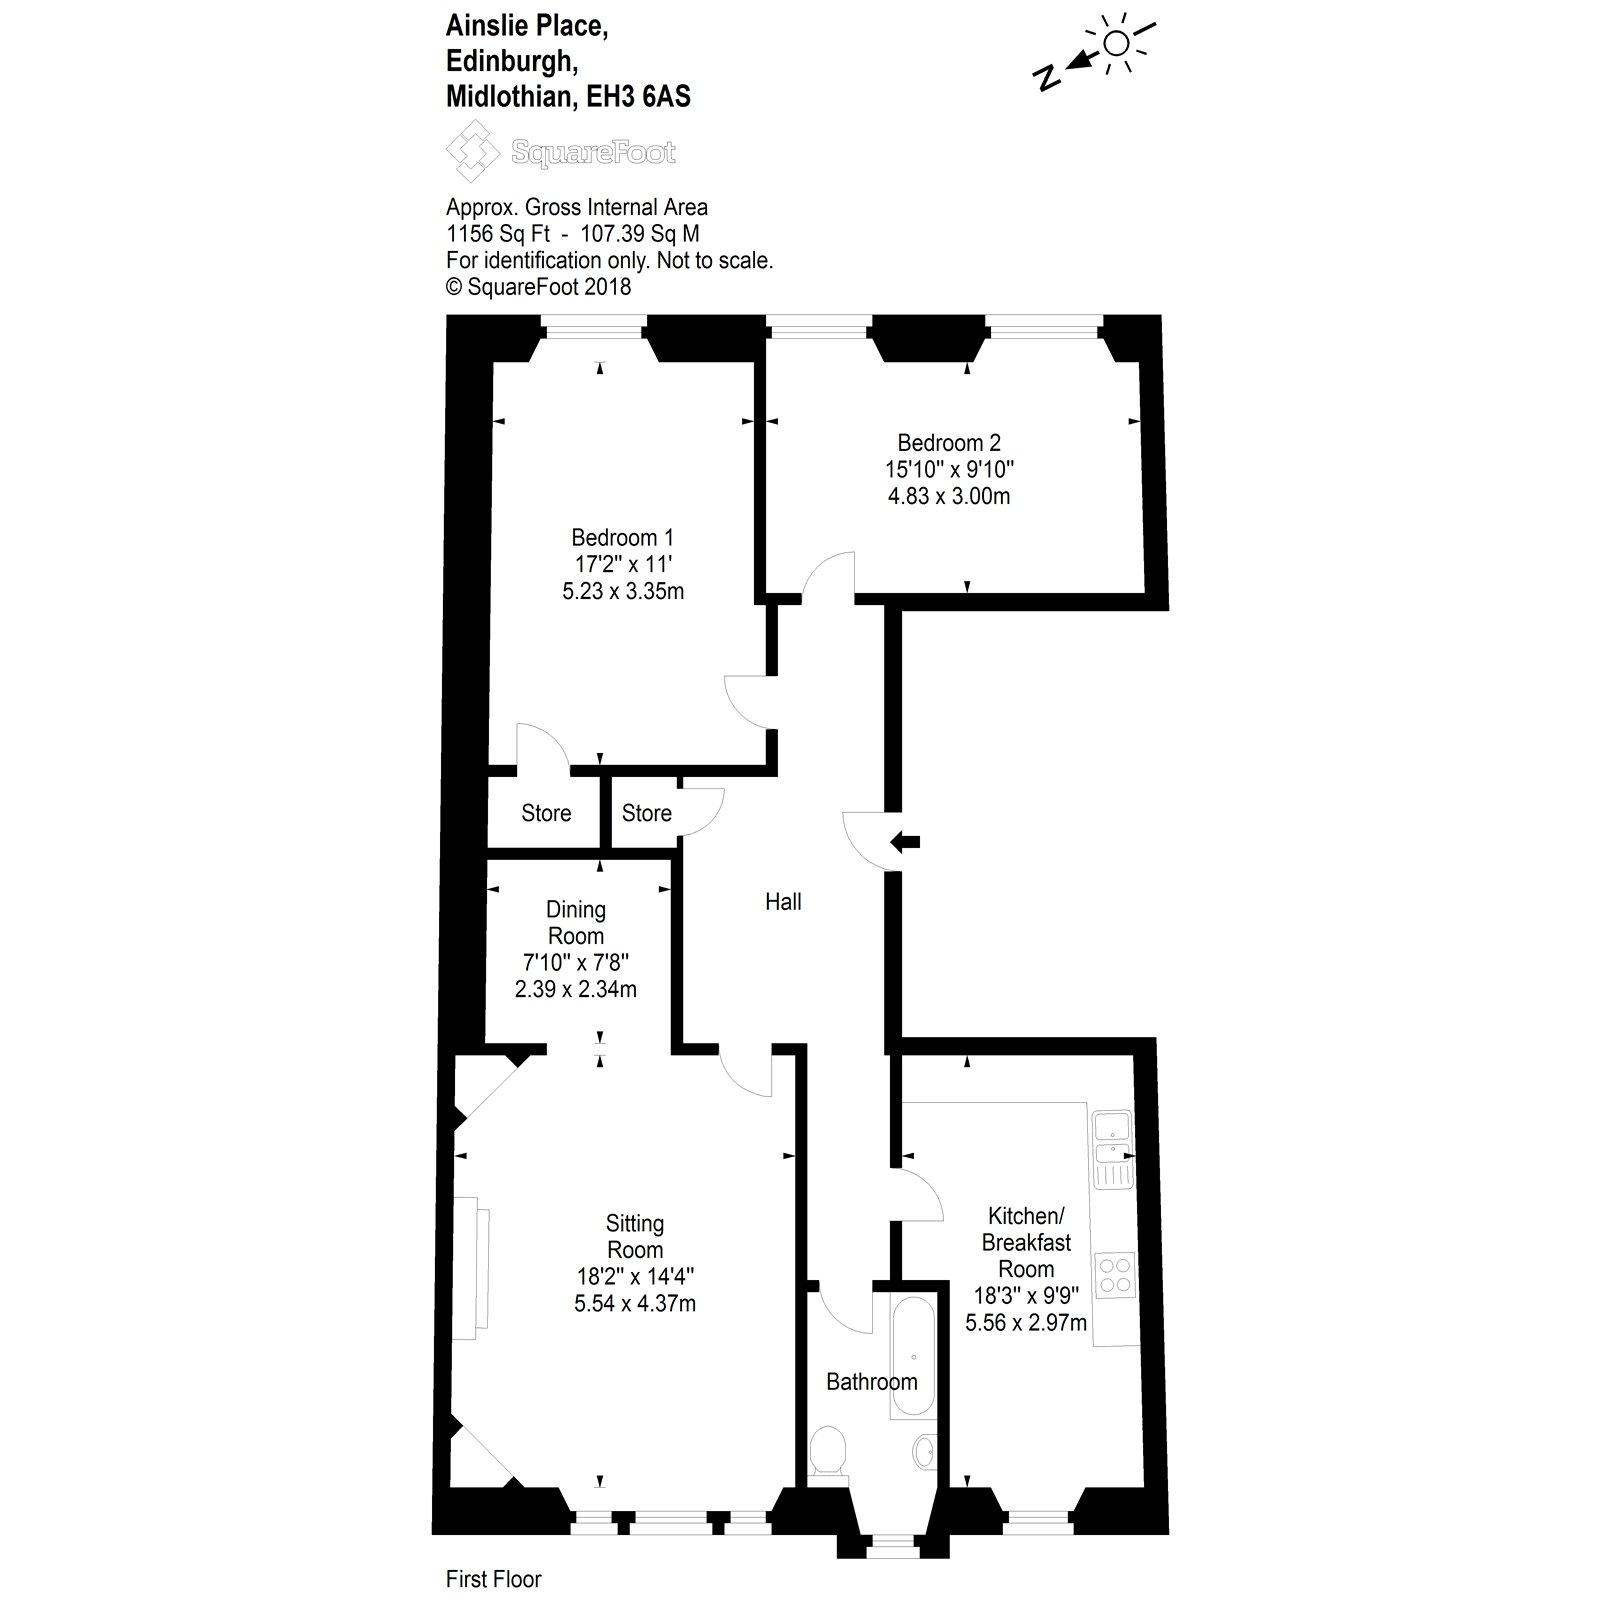 Floorplans For Ainslie Place Edinburgh EH3